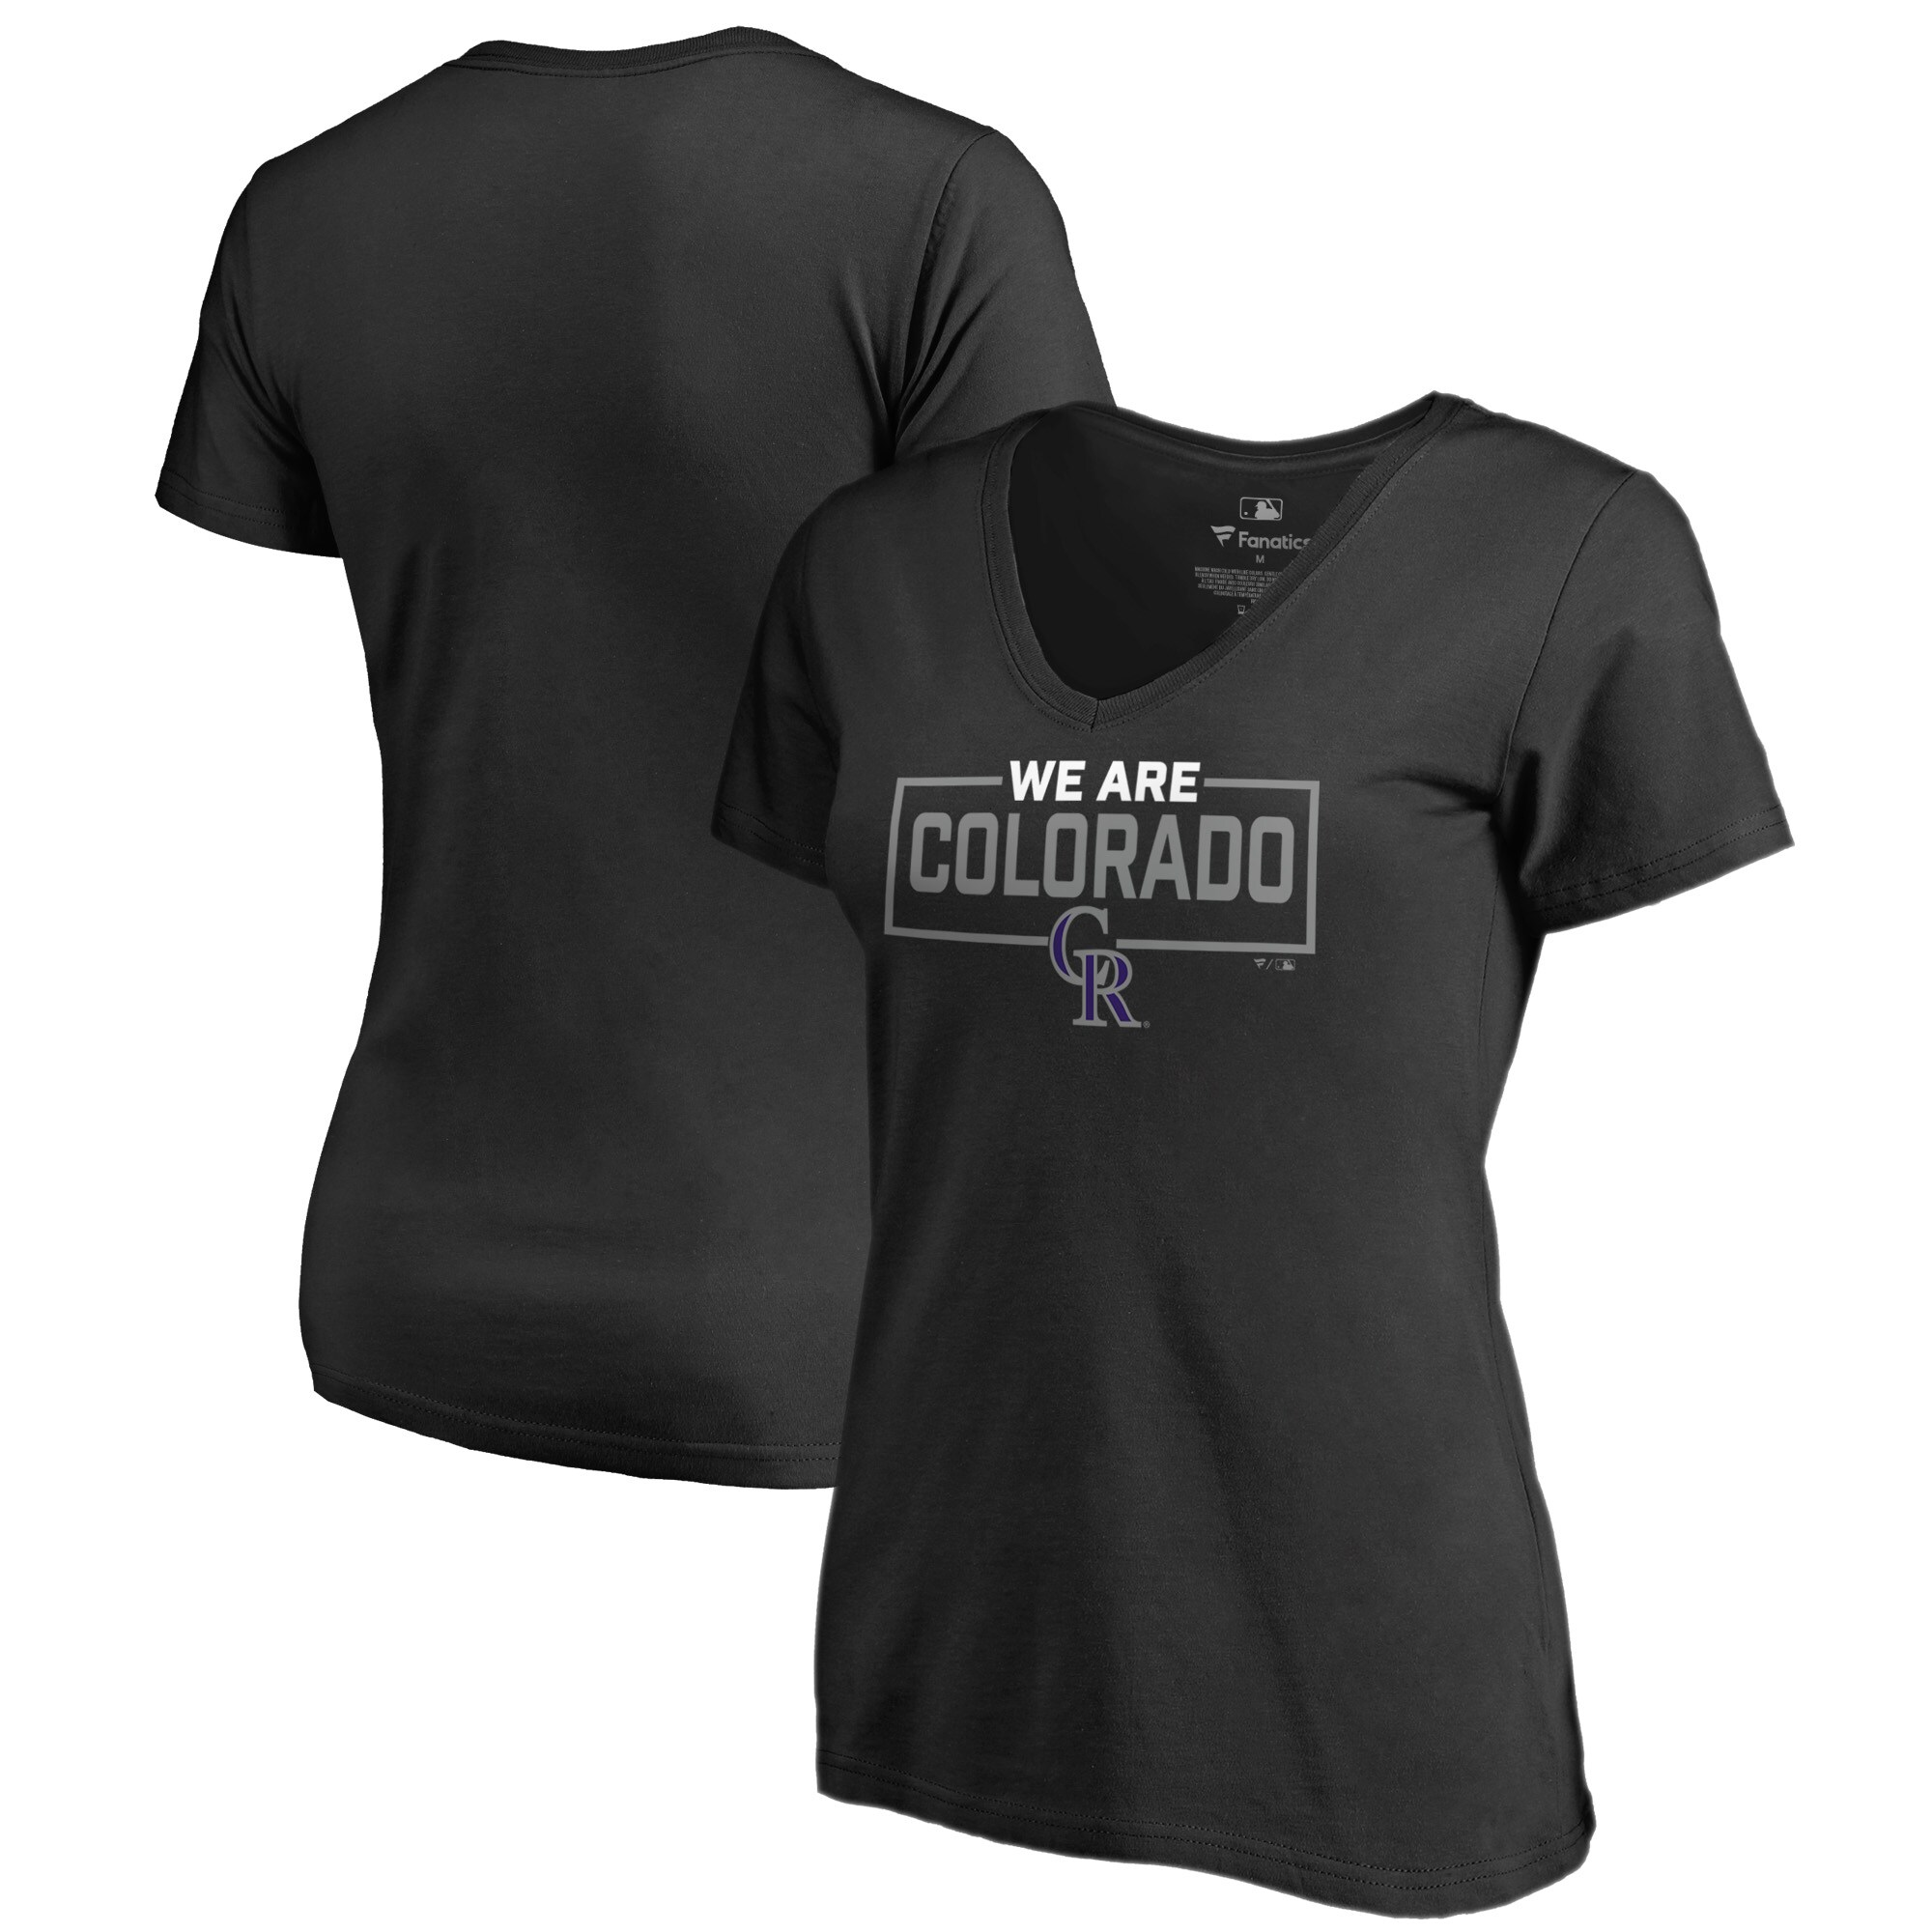 Colorado Rockies Fanatics Branded Women's We Are Icon V-Neck T-Shirt - Black